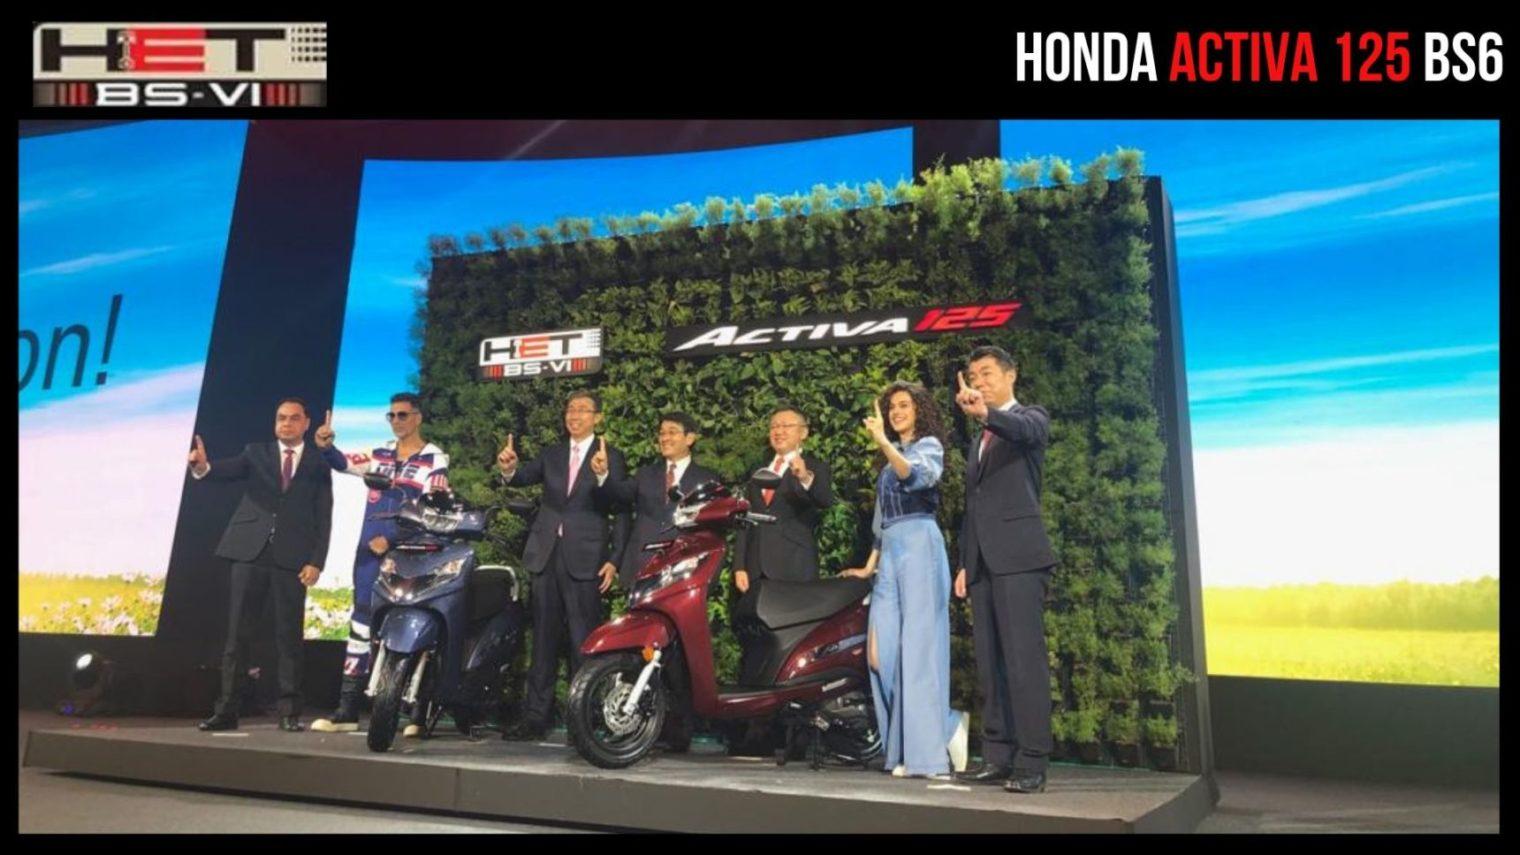 Honda Activa 125 BS6 Launched – 5 Things To Know - GaadiWaadi.com thumbnail